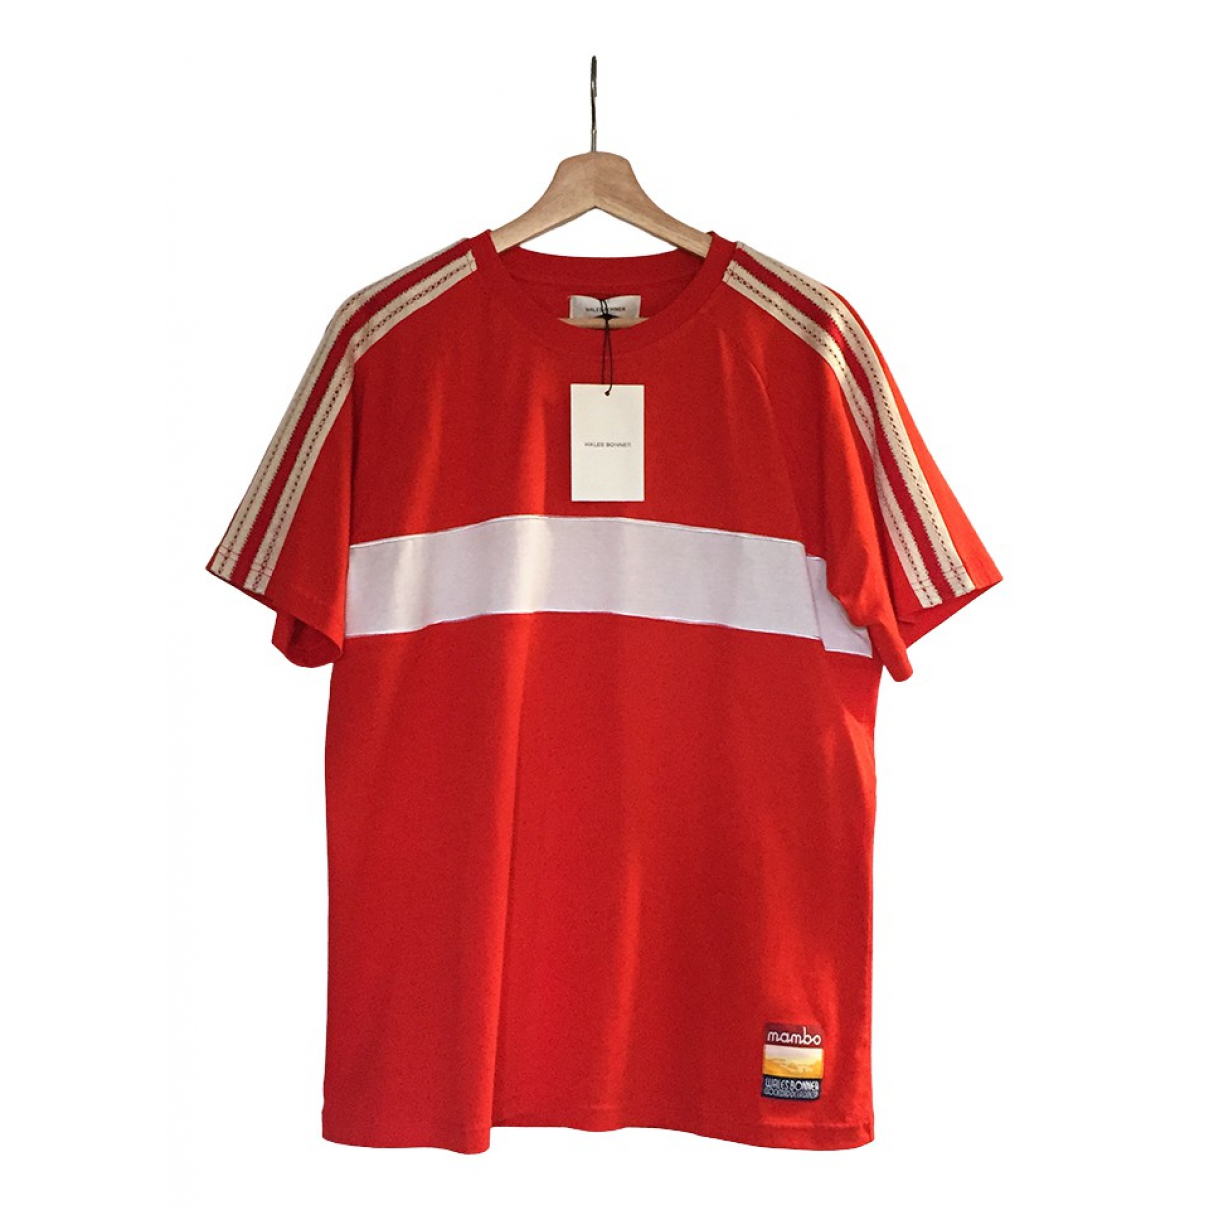 Wales Bonner N Red Cotton  top for Women XL International